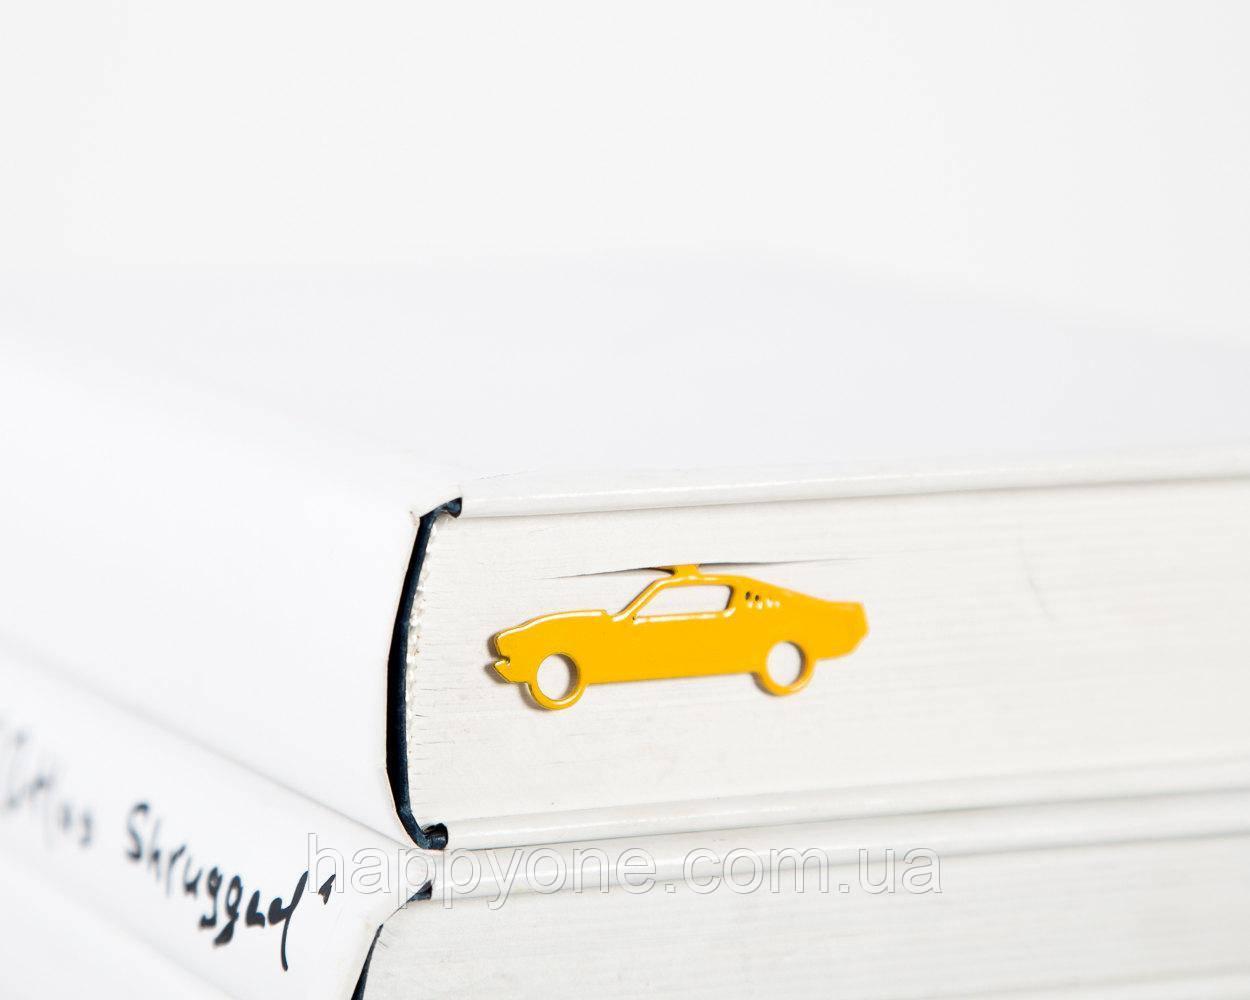 Закладка для книг Мустанг